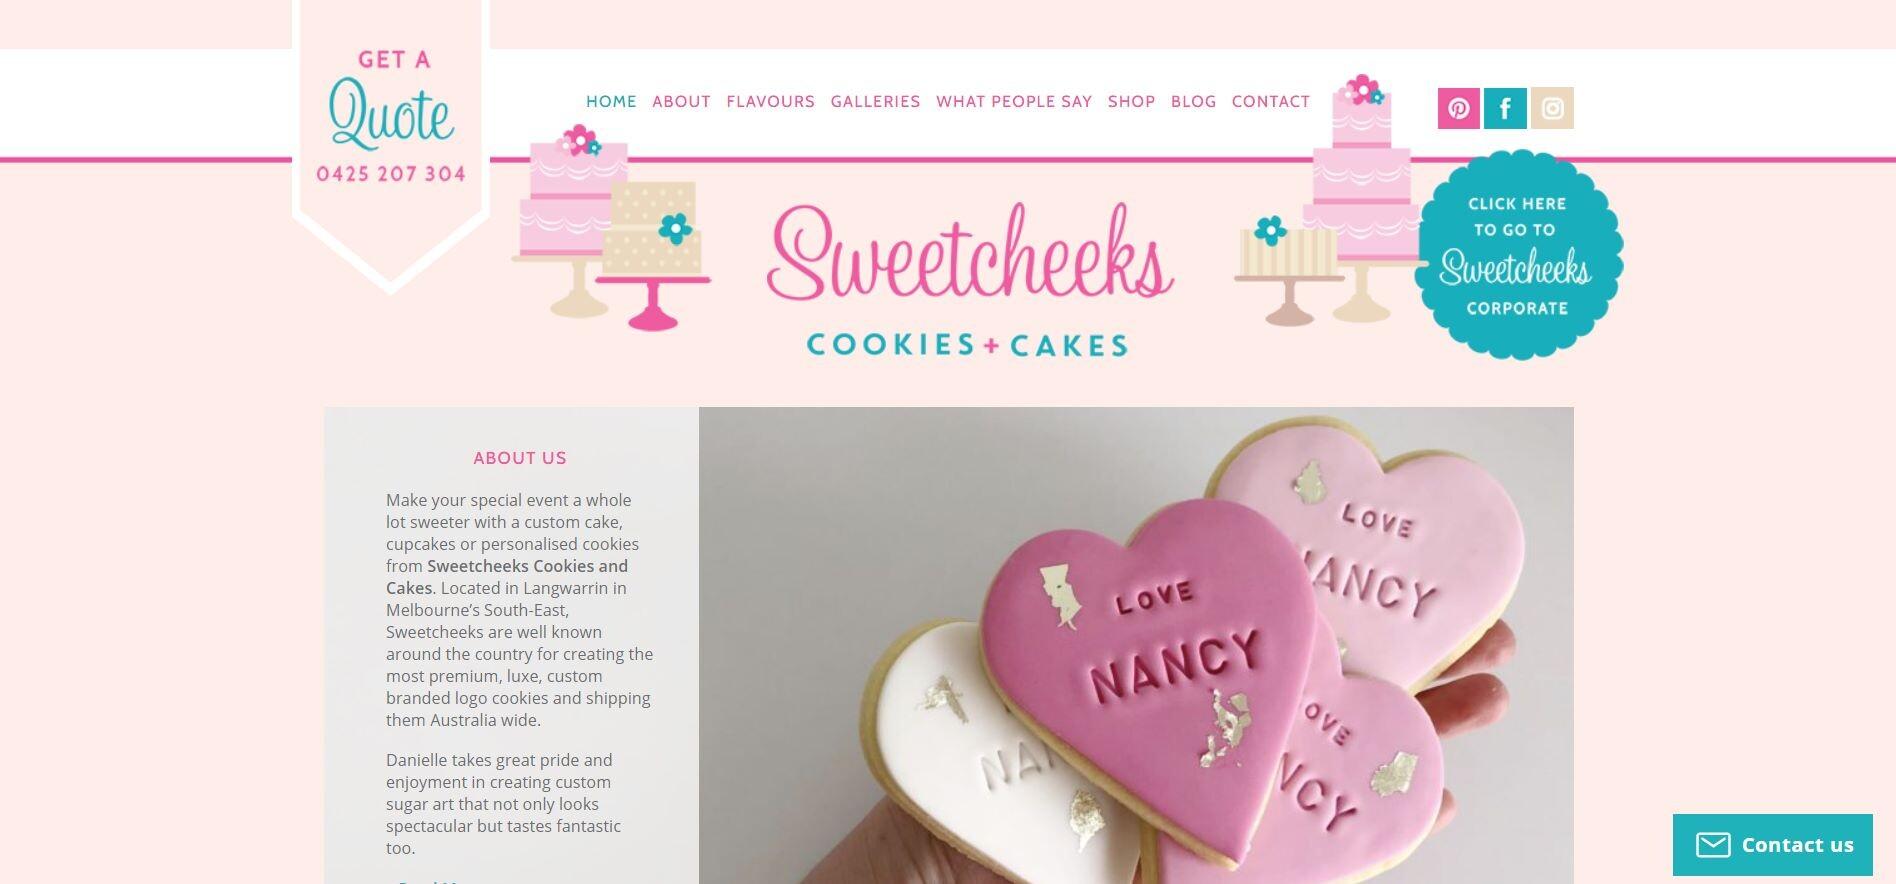 Top 50 Wedding Cake Shops in Melbourne [2021]